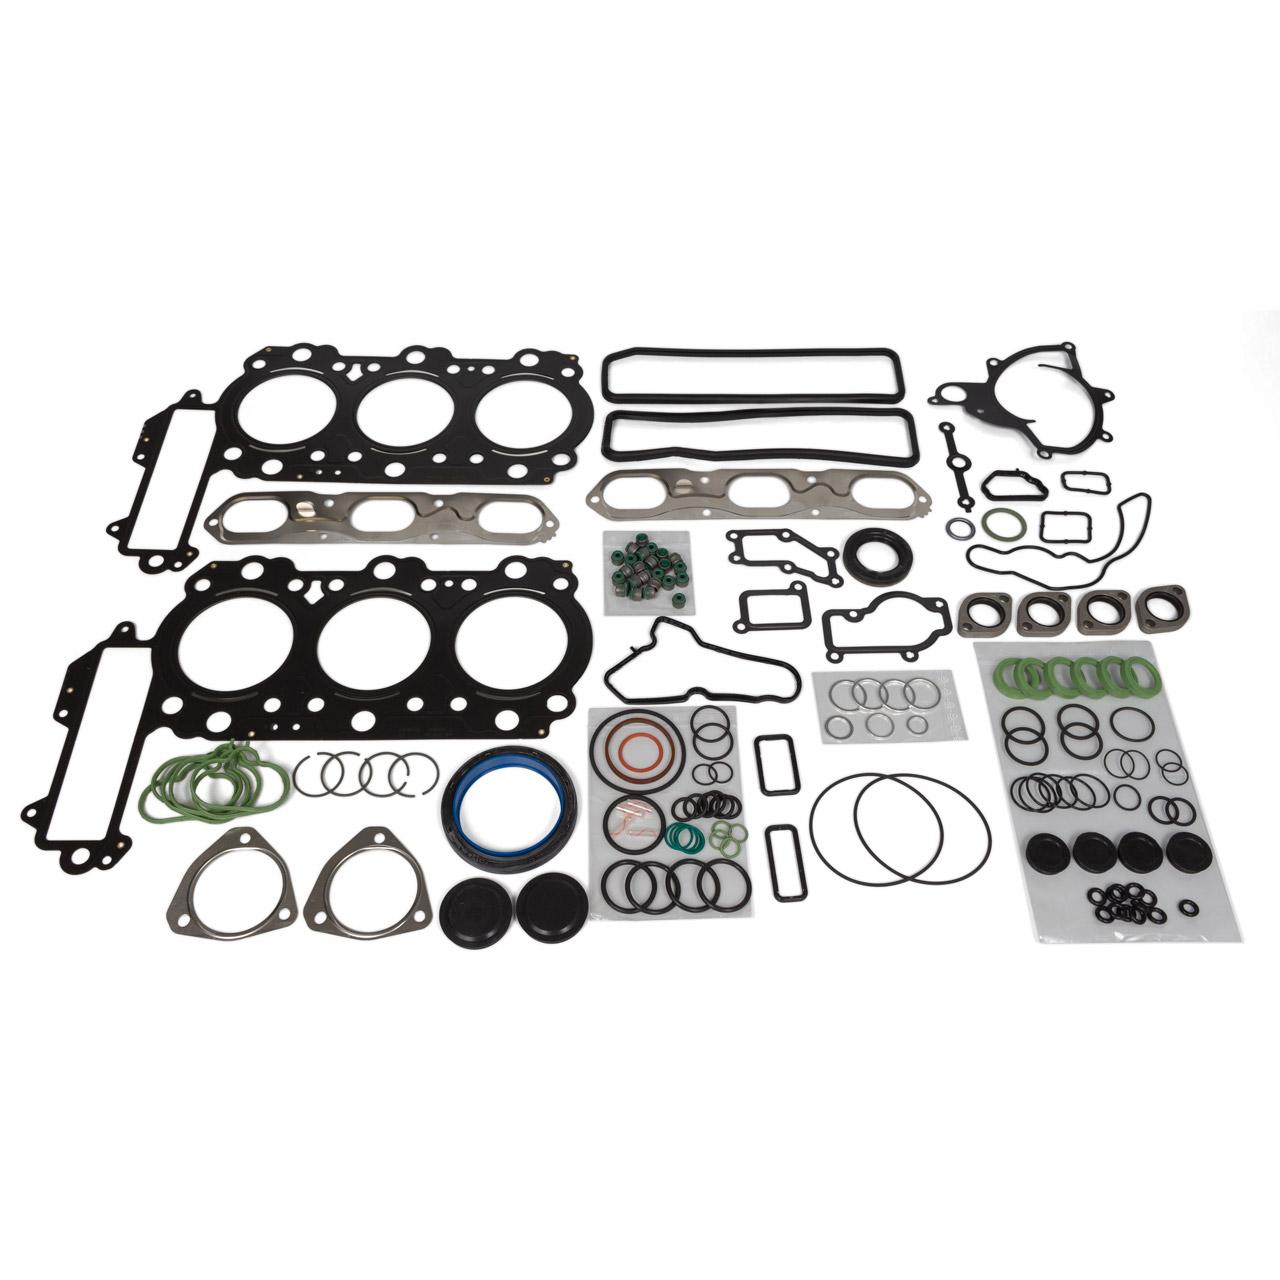 Motordichtungssatz PORSCHE Boxster Cayman 987 S 3.4 M97.21 M97.22